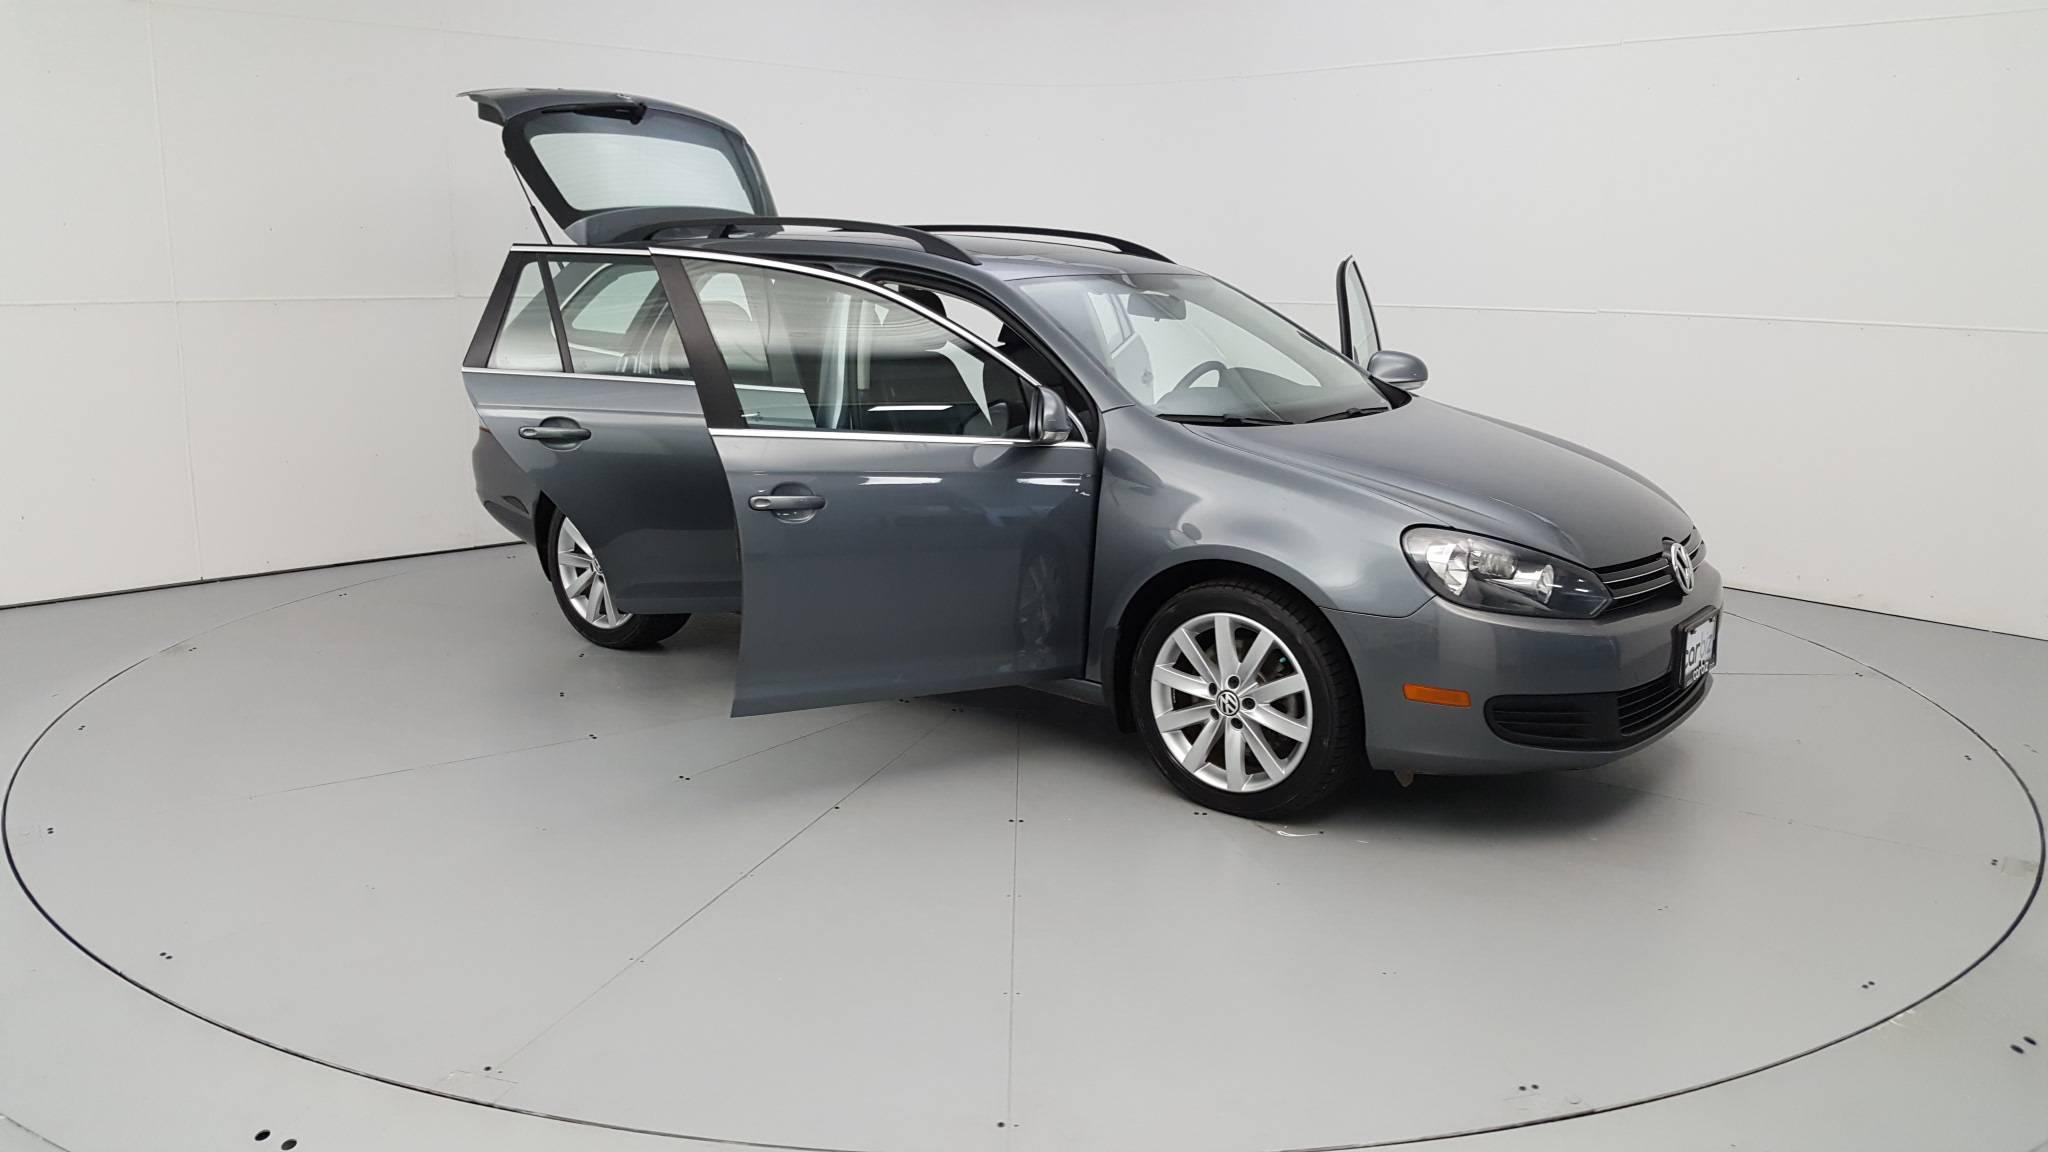 Pre-Owned 2012 Volkswagen Jetta TDI w/Sunroof